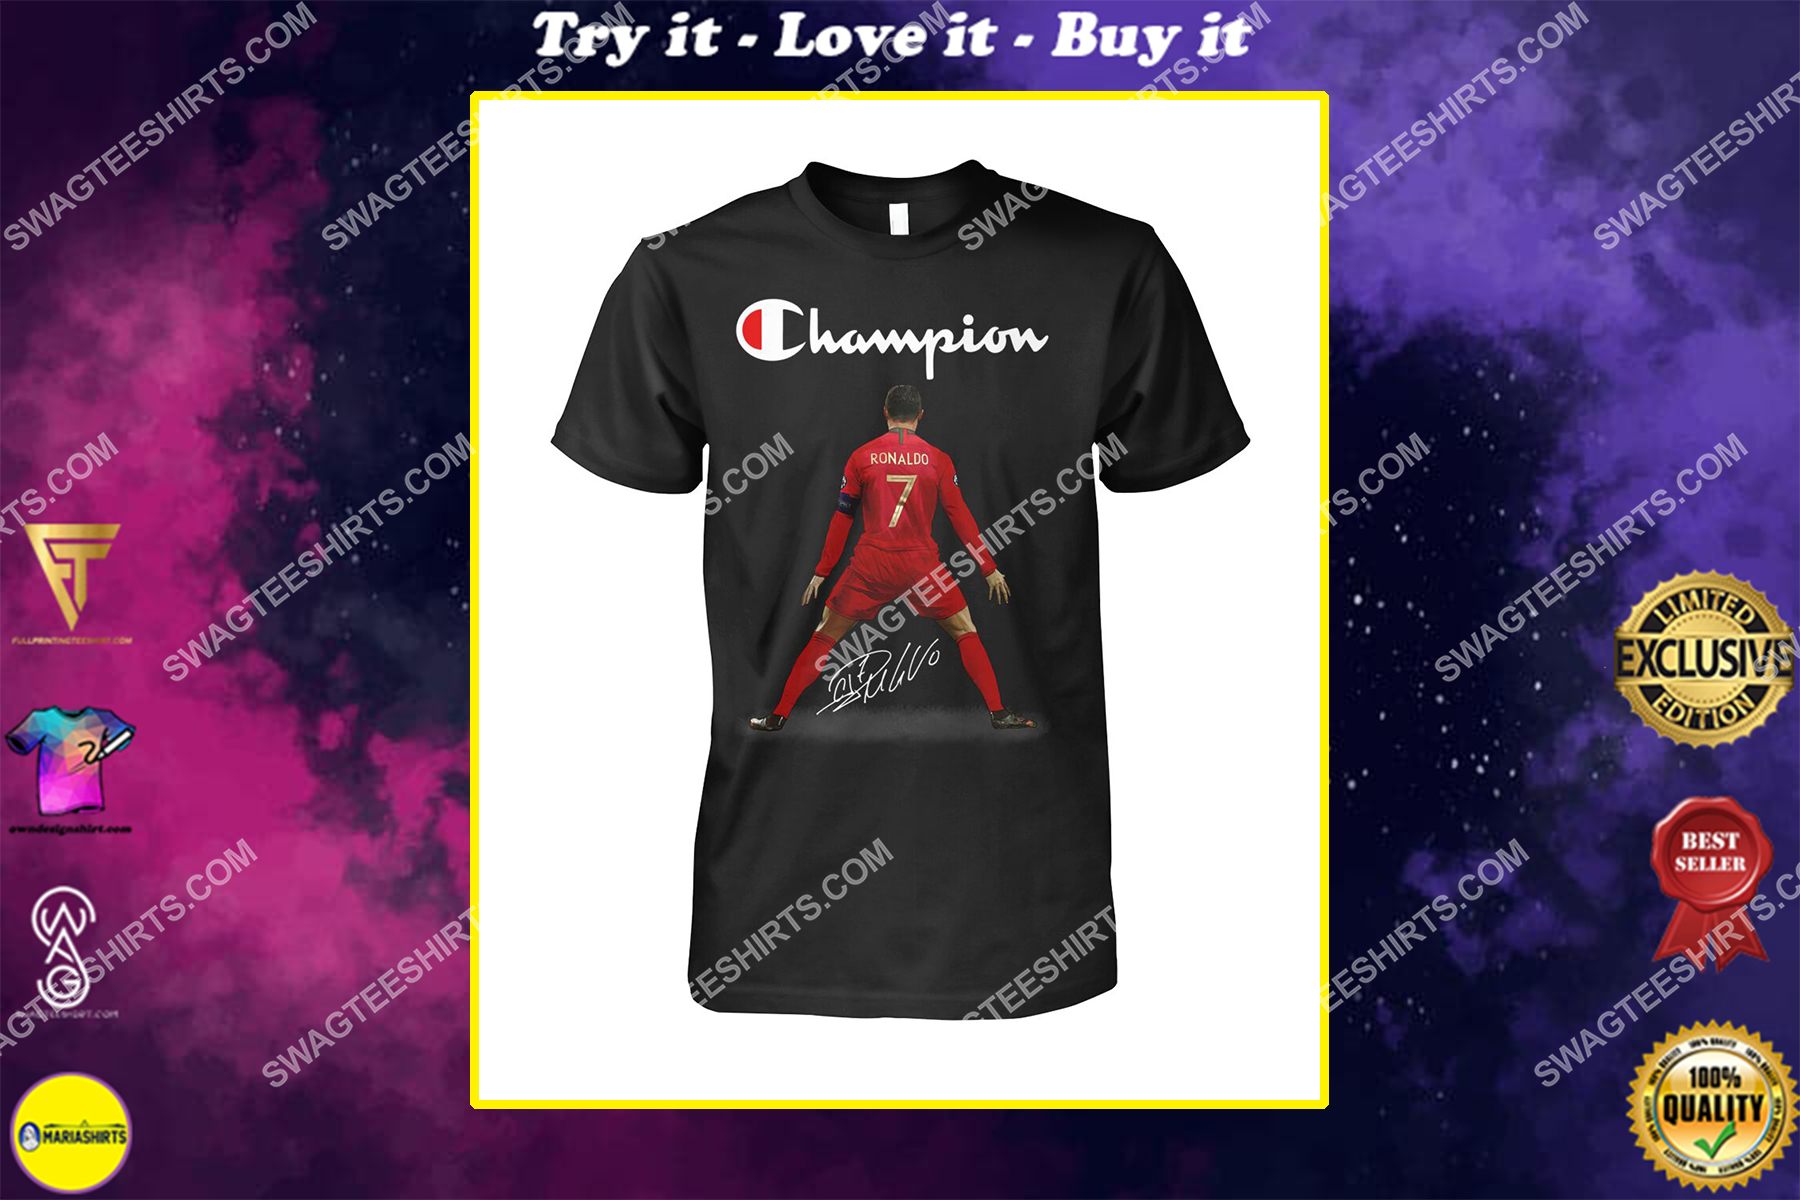 champion cristiano ronaldo signature shirt